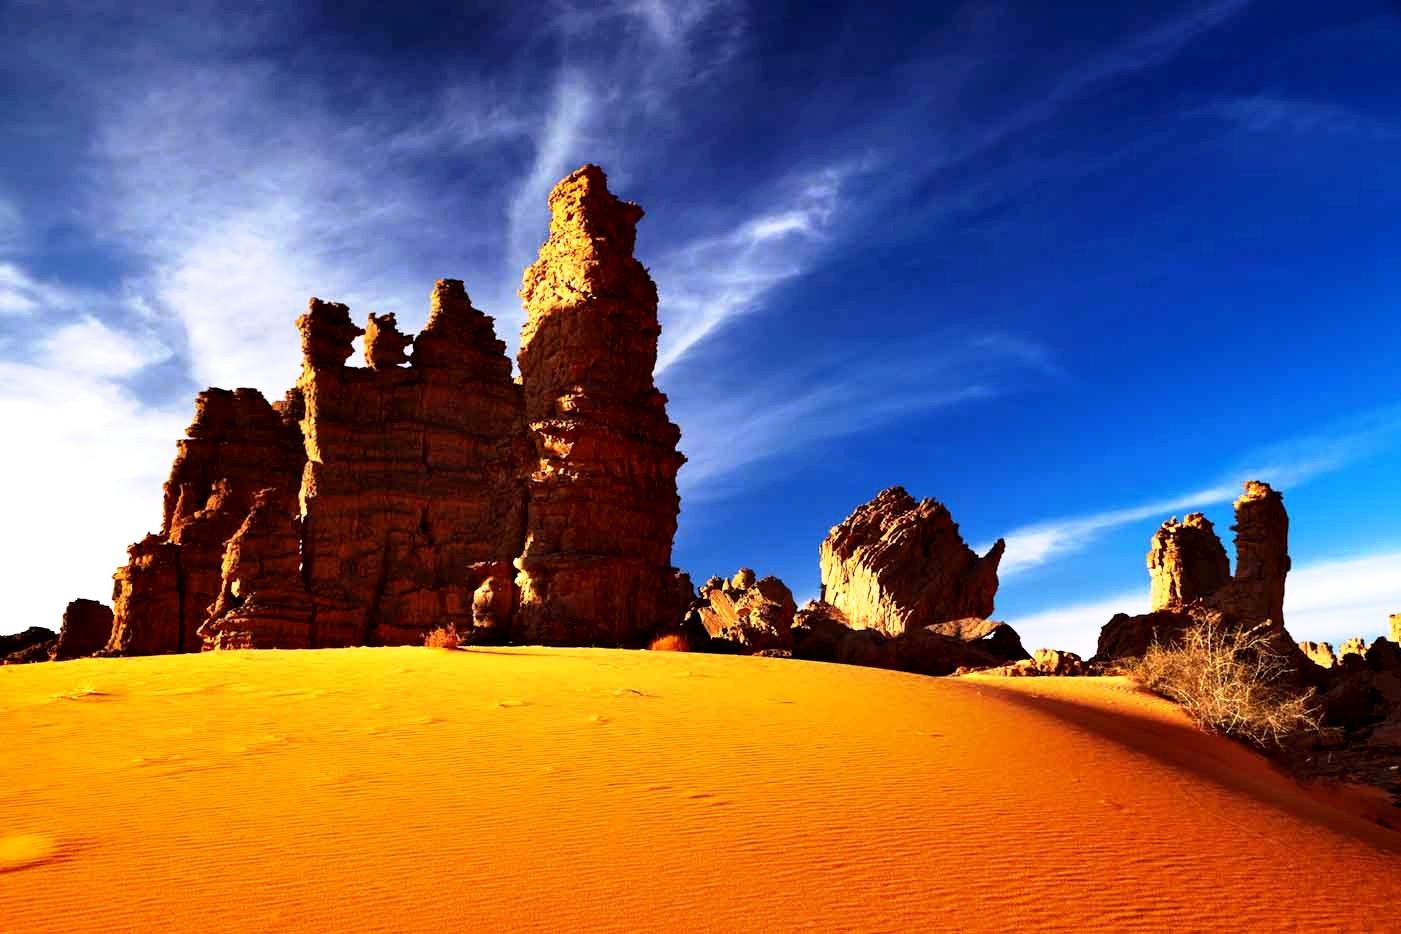 марсианский пейзаж тассилин аджер